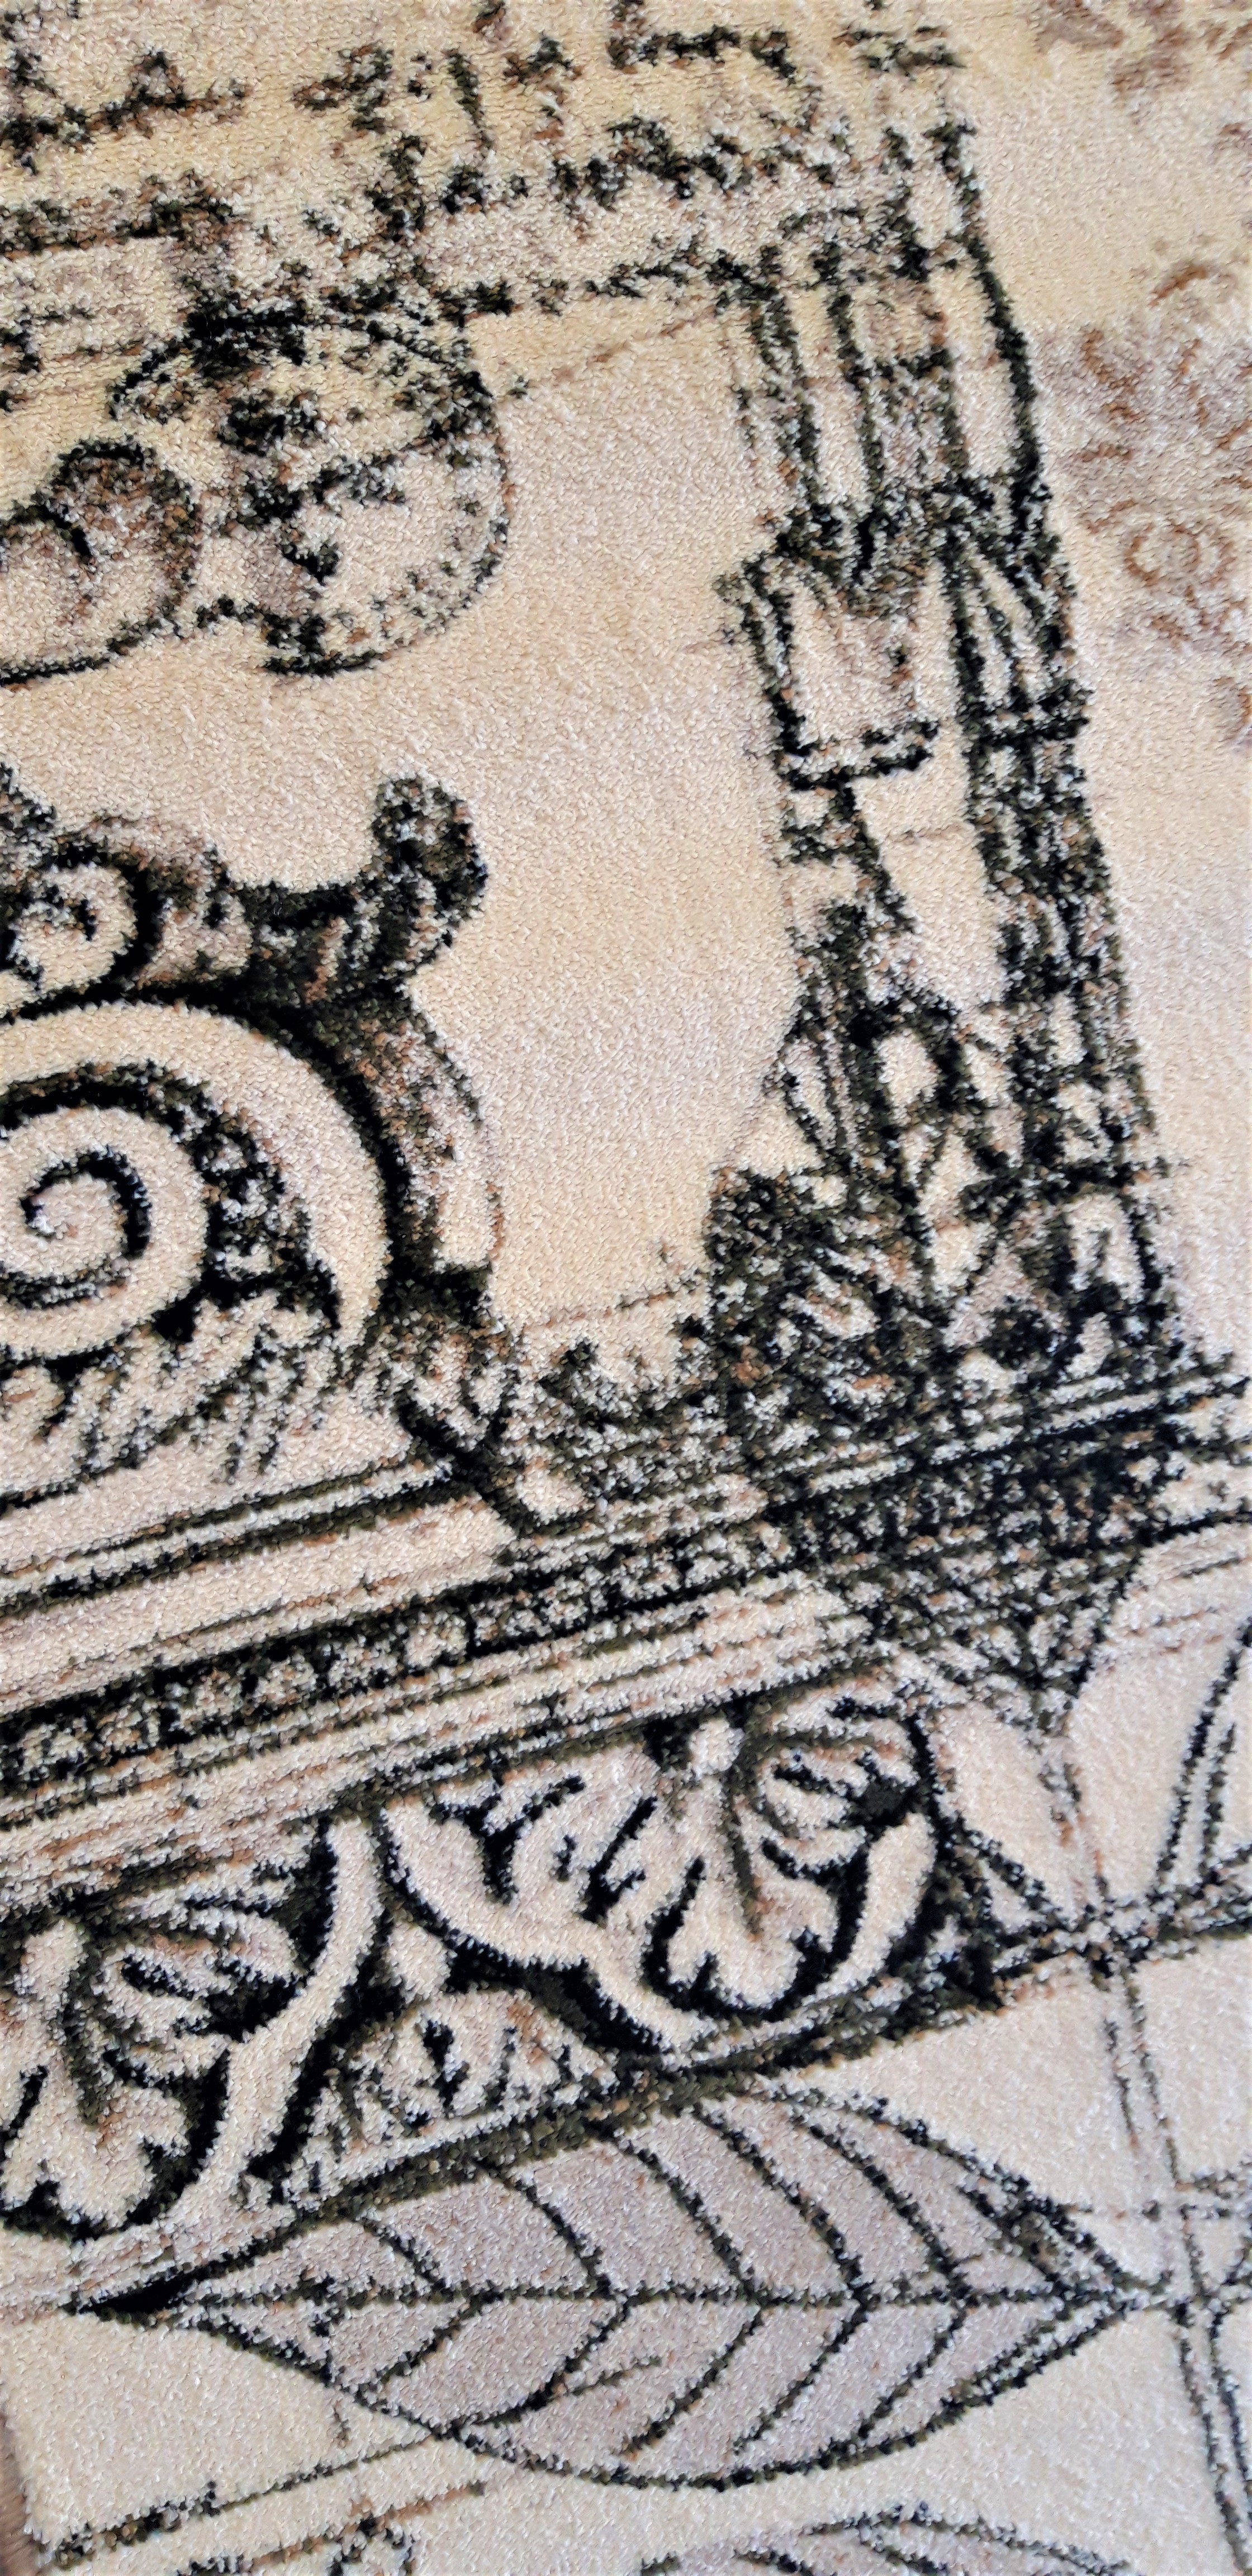 Covor Modern, Lotos Frunze 1545, Crem / Bej / Gri, Oval, 160x230 cm, 1800 gr/mp [6]